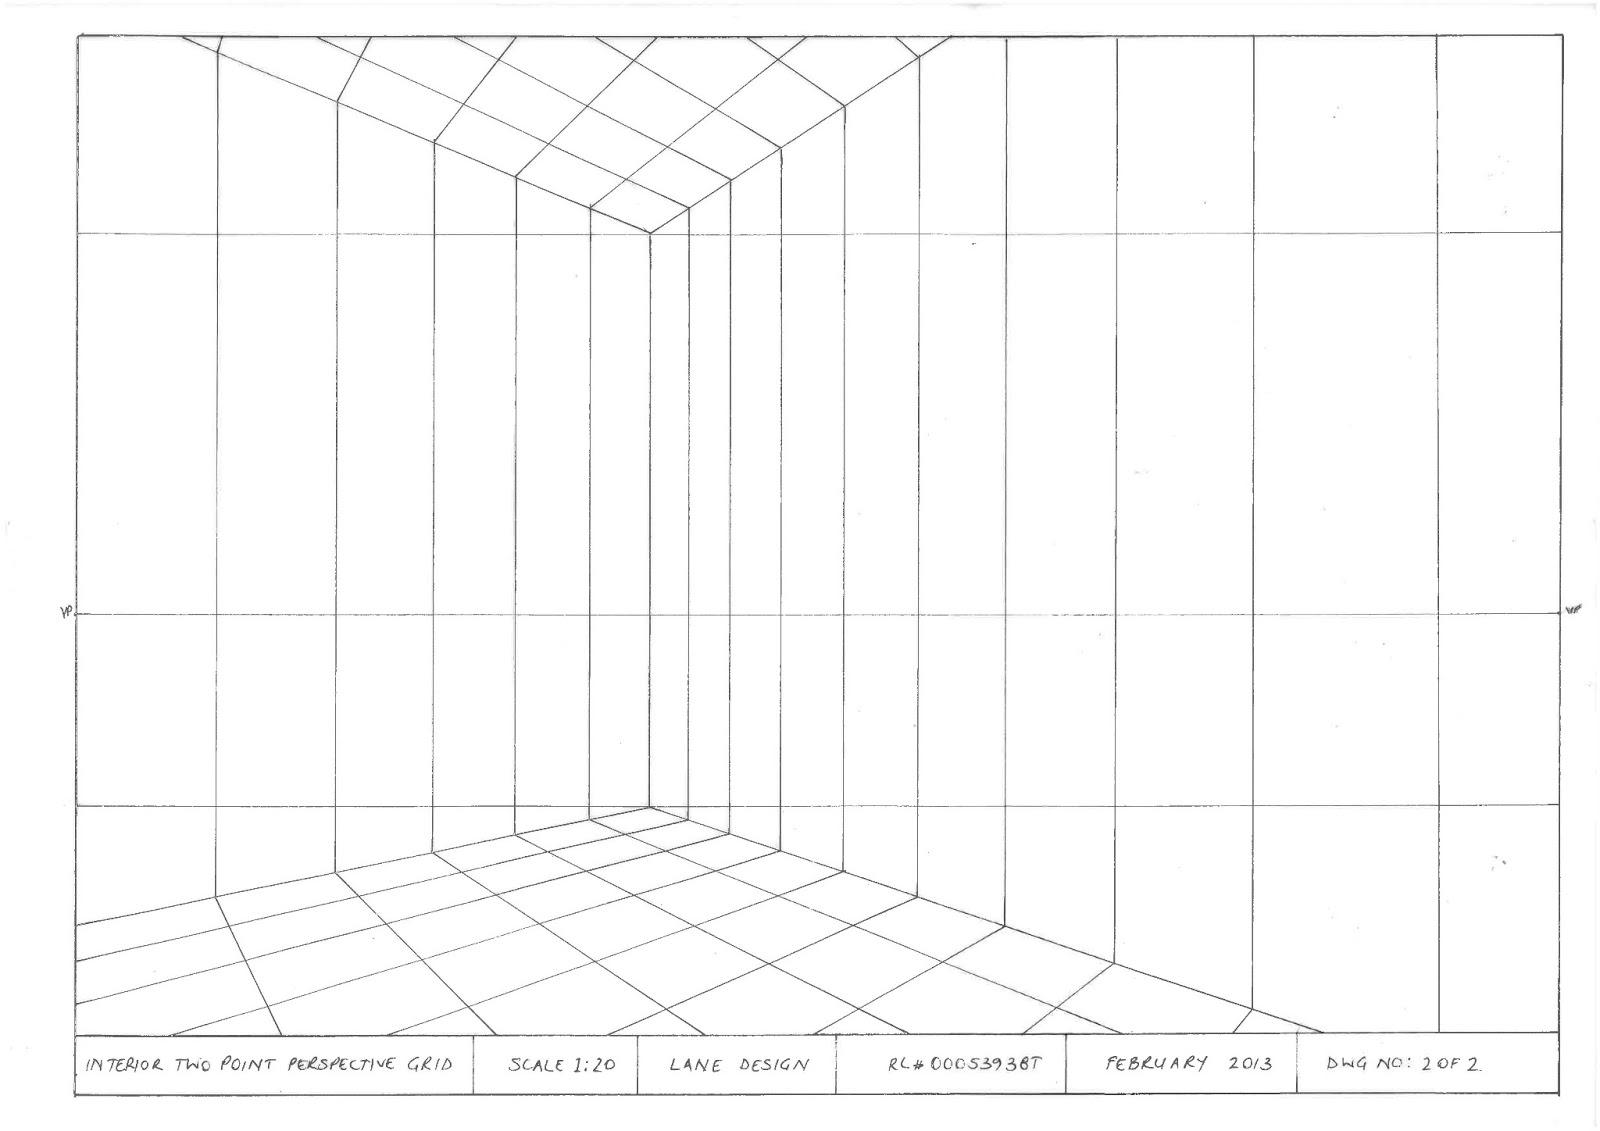 Interiors: DPID022B_Intermediate Drafting_Assessment 01 & 02